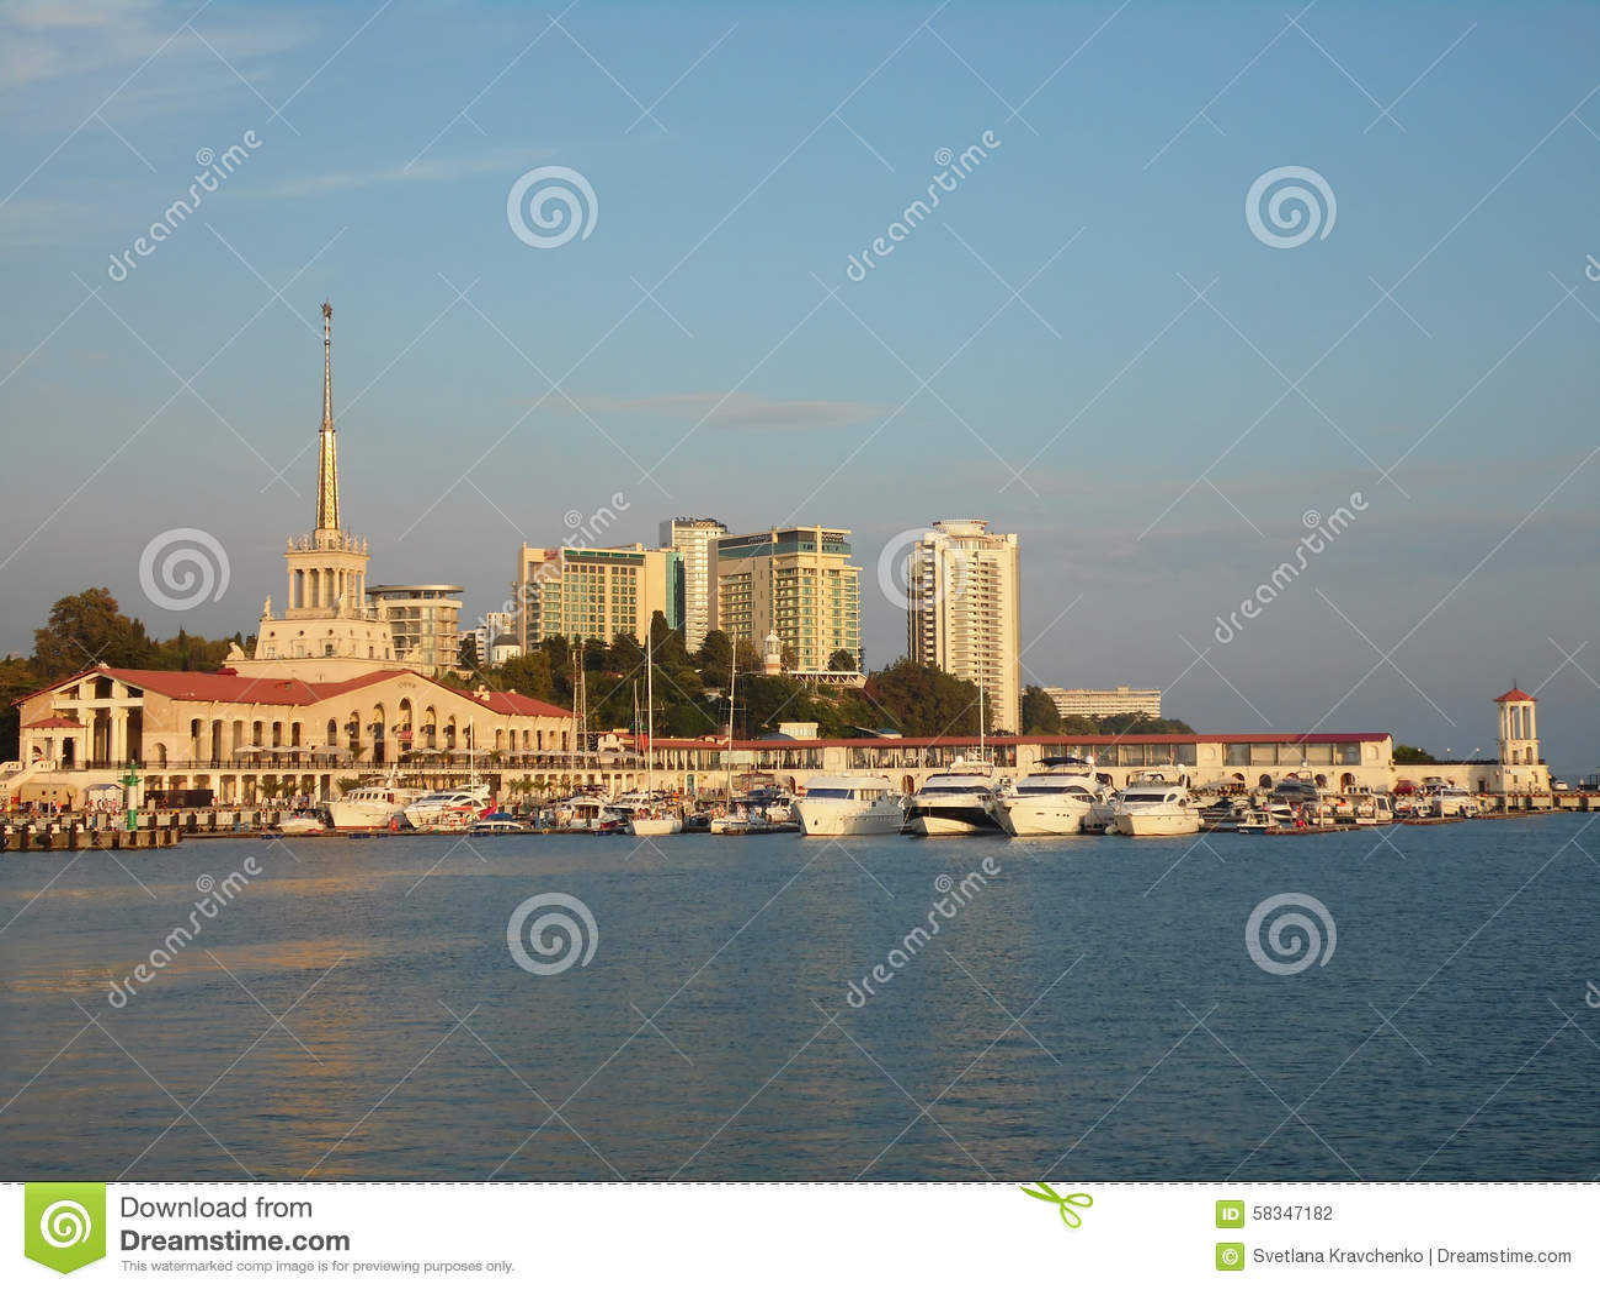 Resort Sochi, Russia, the ships at the marina and the city